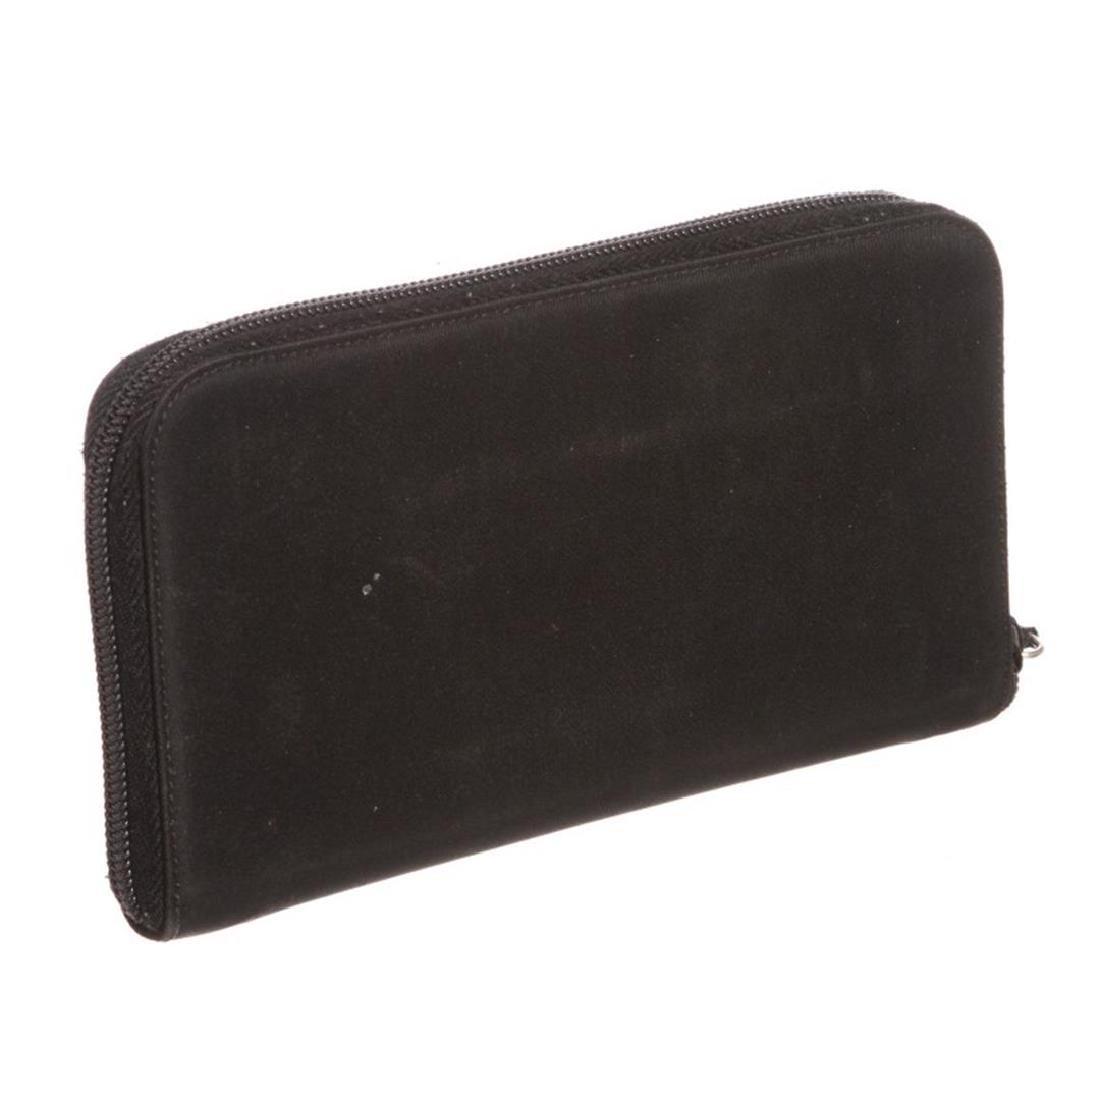 Prada Black Nylon Leather Zipper Wallet - 3